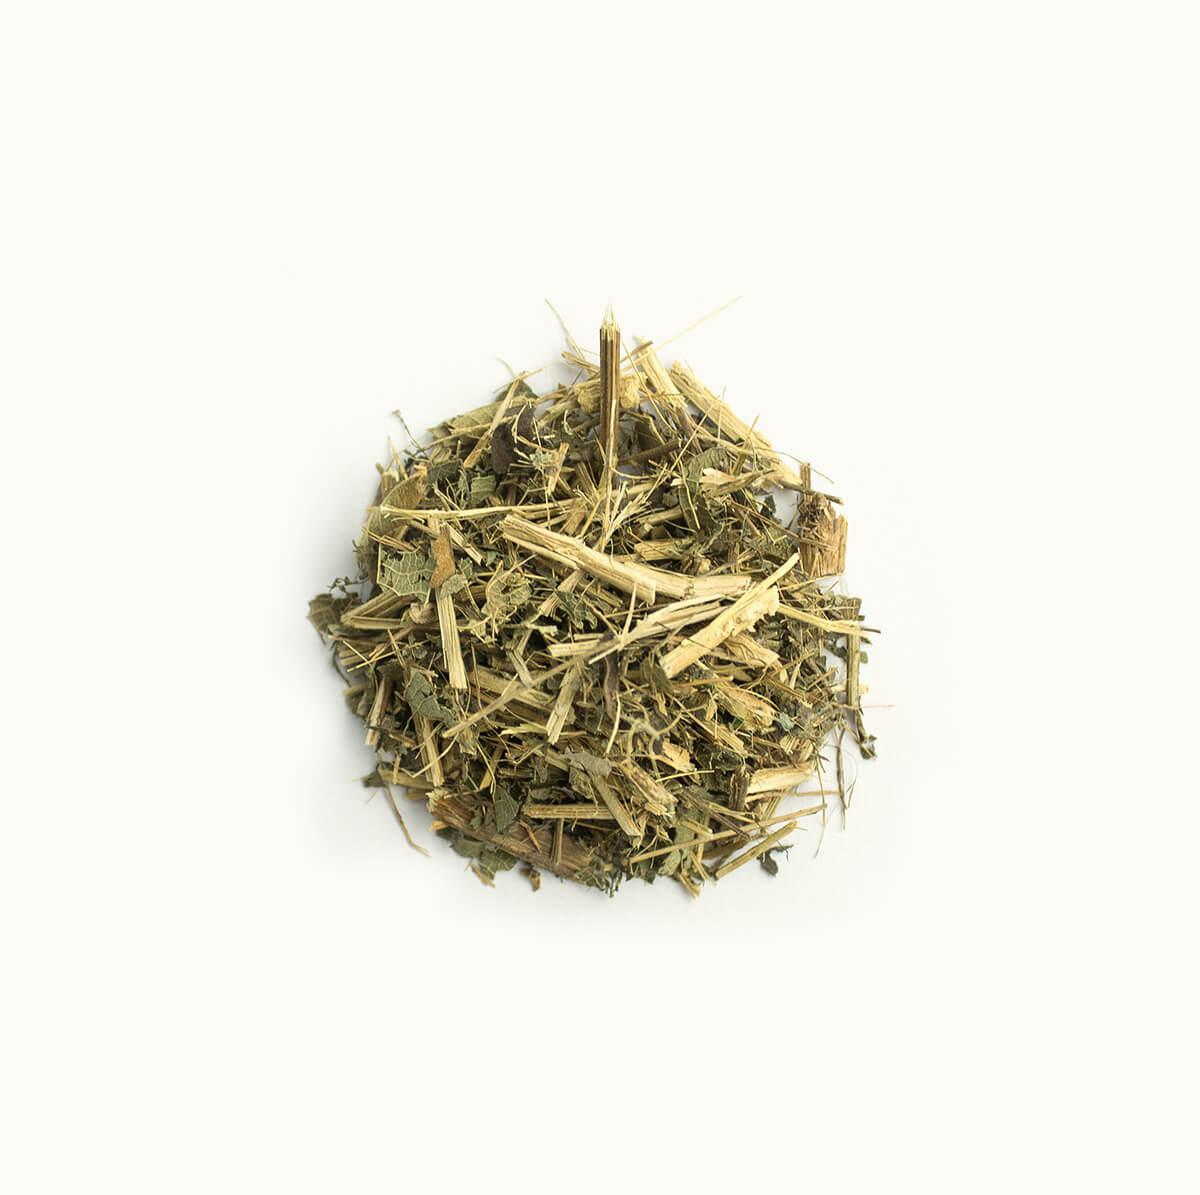 ASSA PEIXE - Vernonia spp - 30g